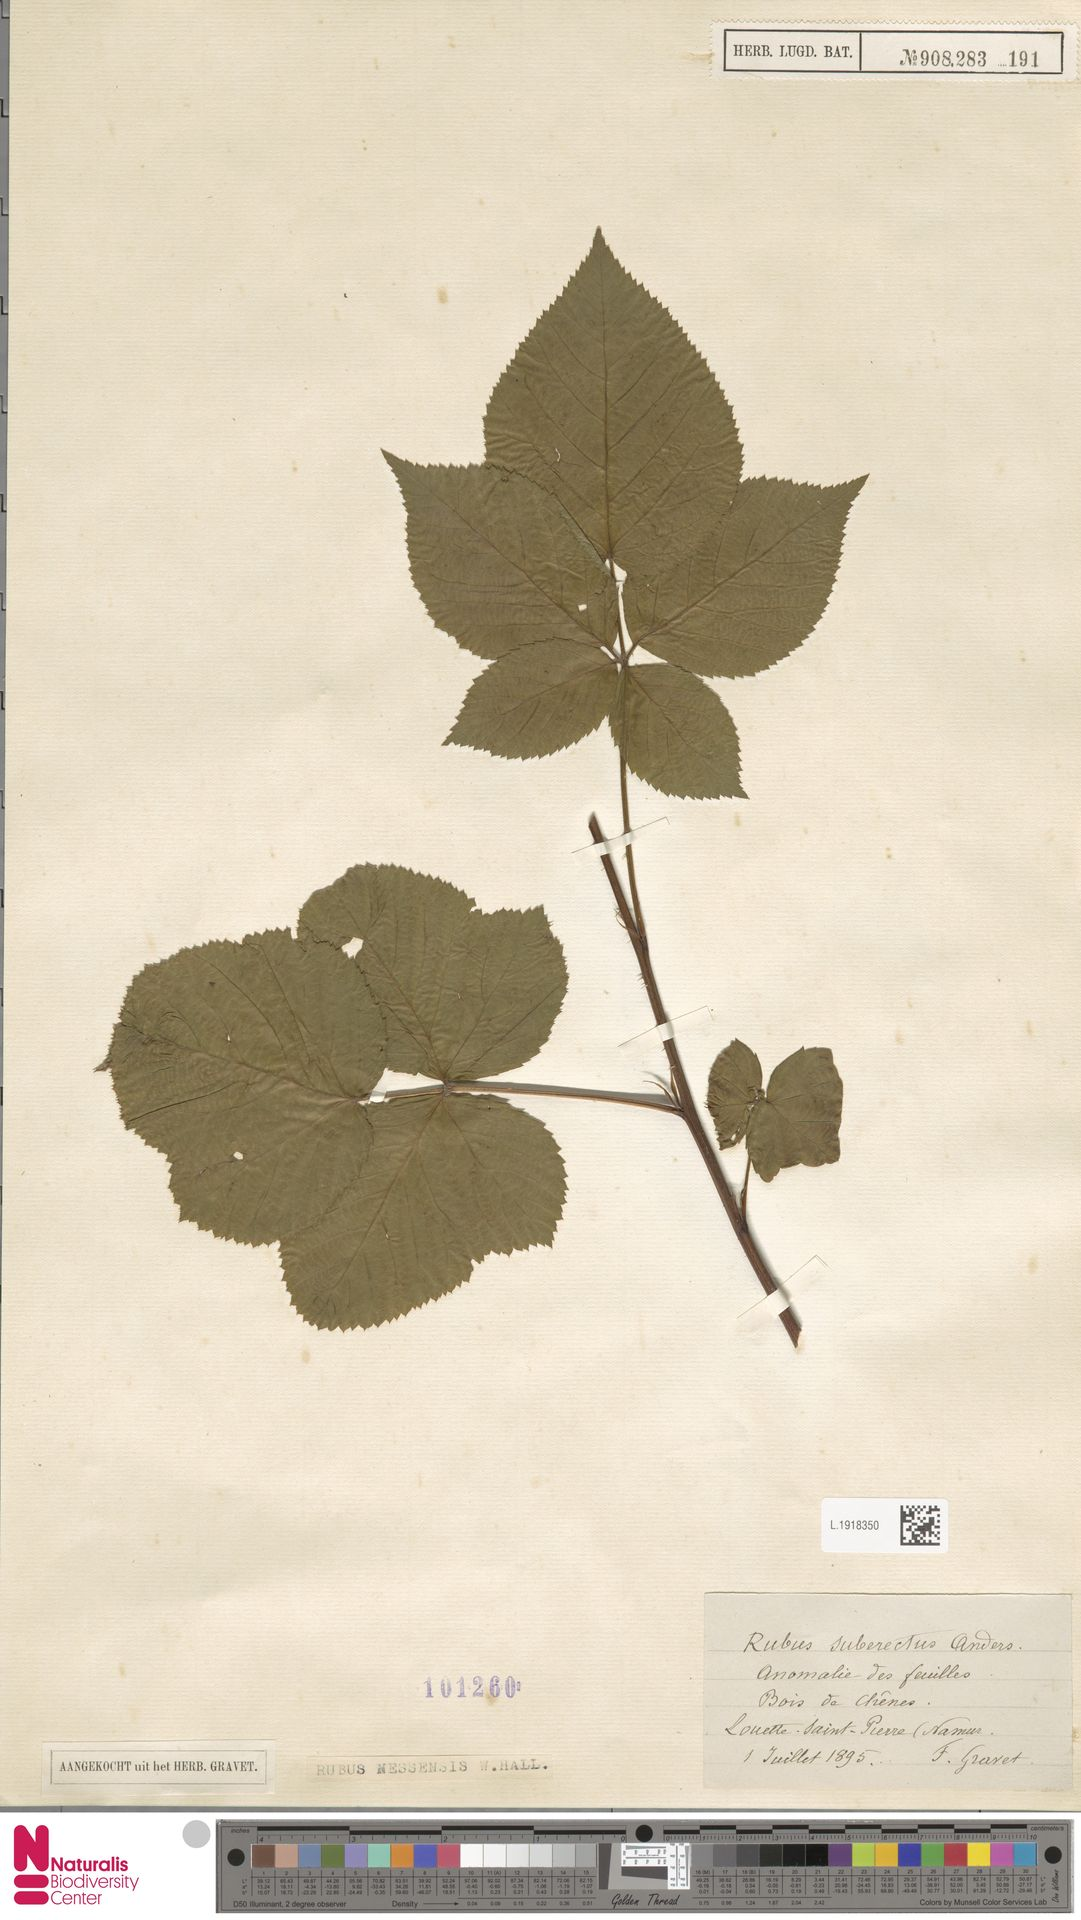 L.1918350 | Rubus nessensis Hall